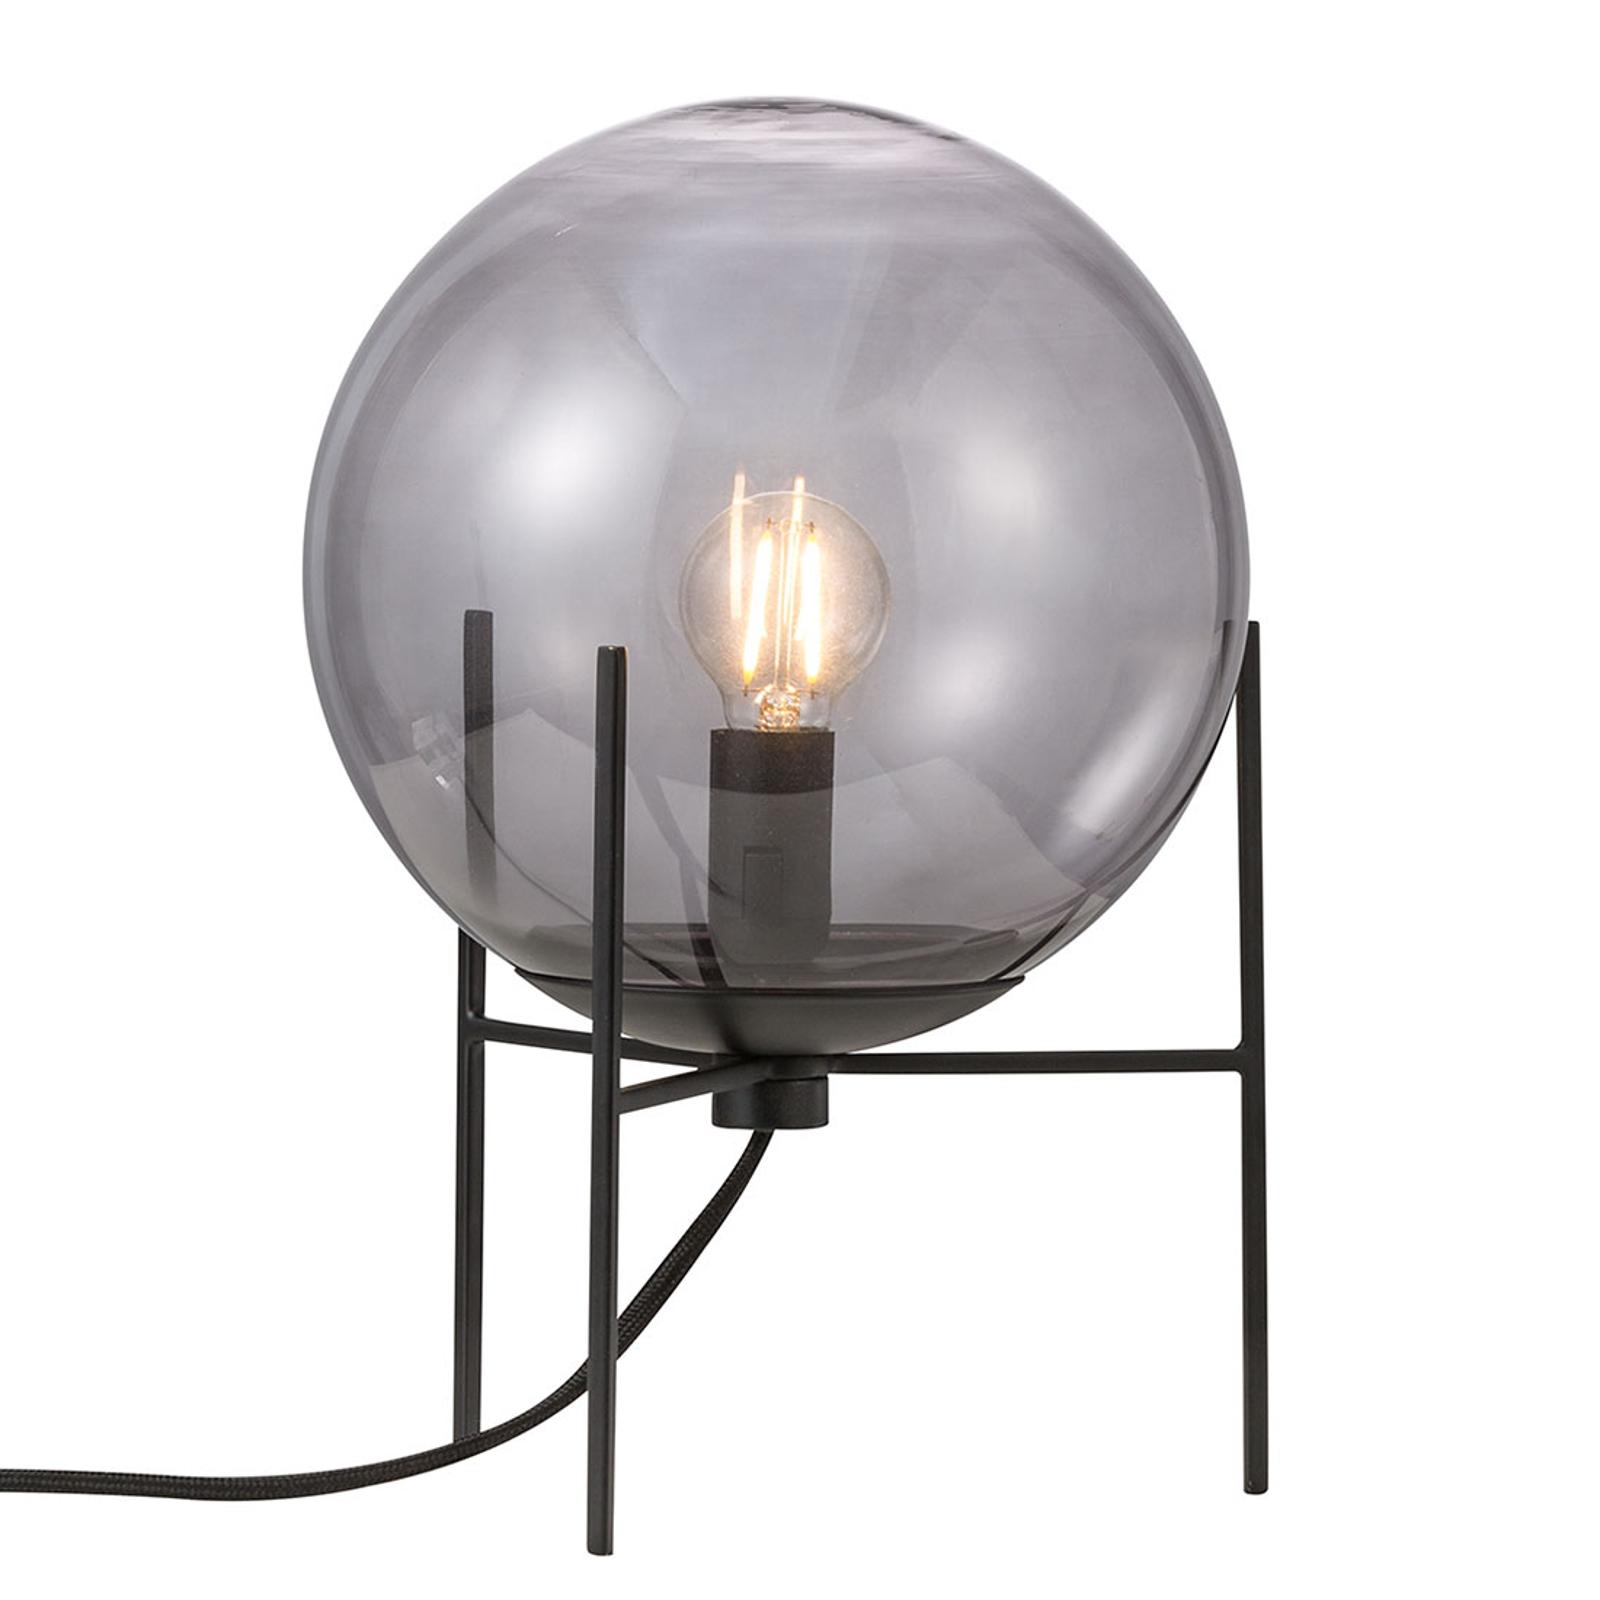 Tafellamp Alton met rookgrijze glazen kap